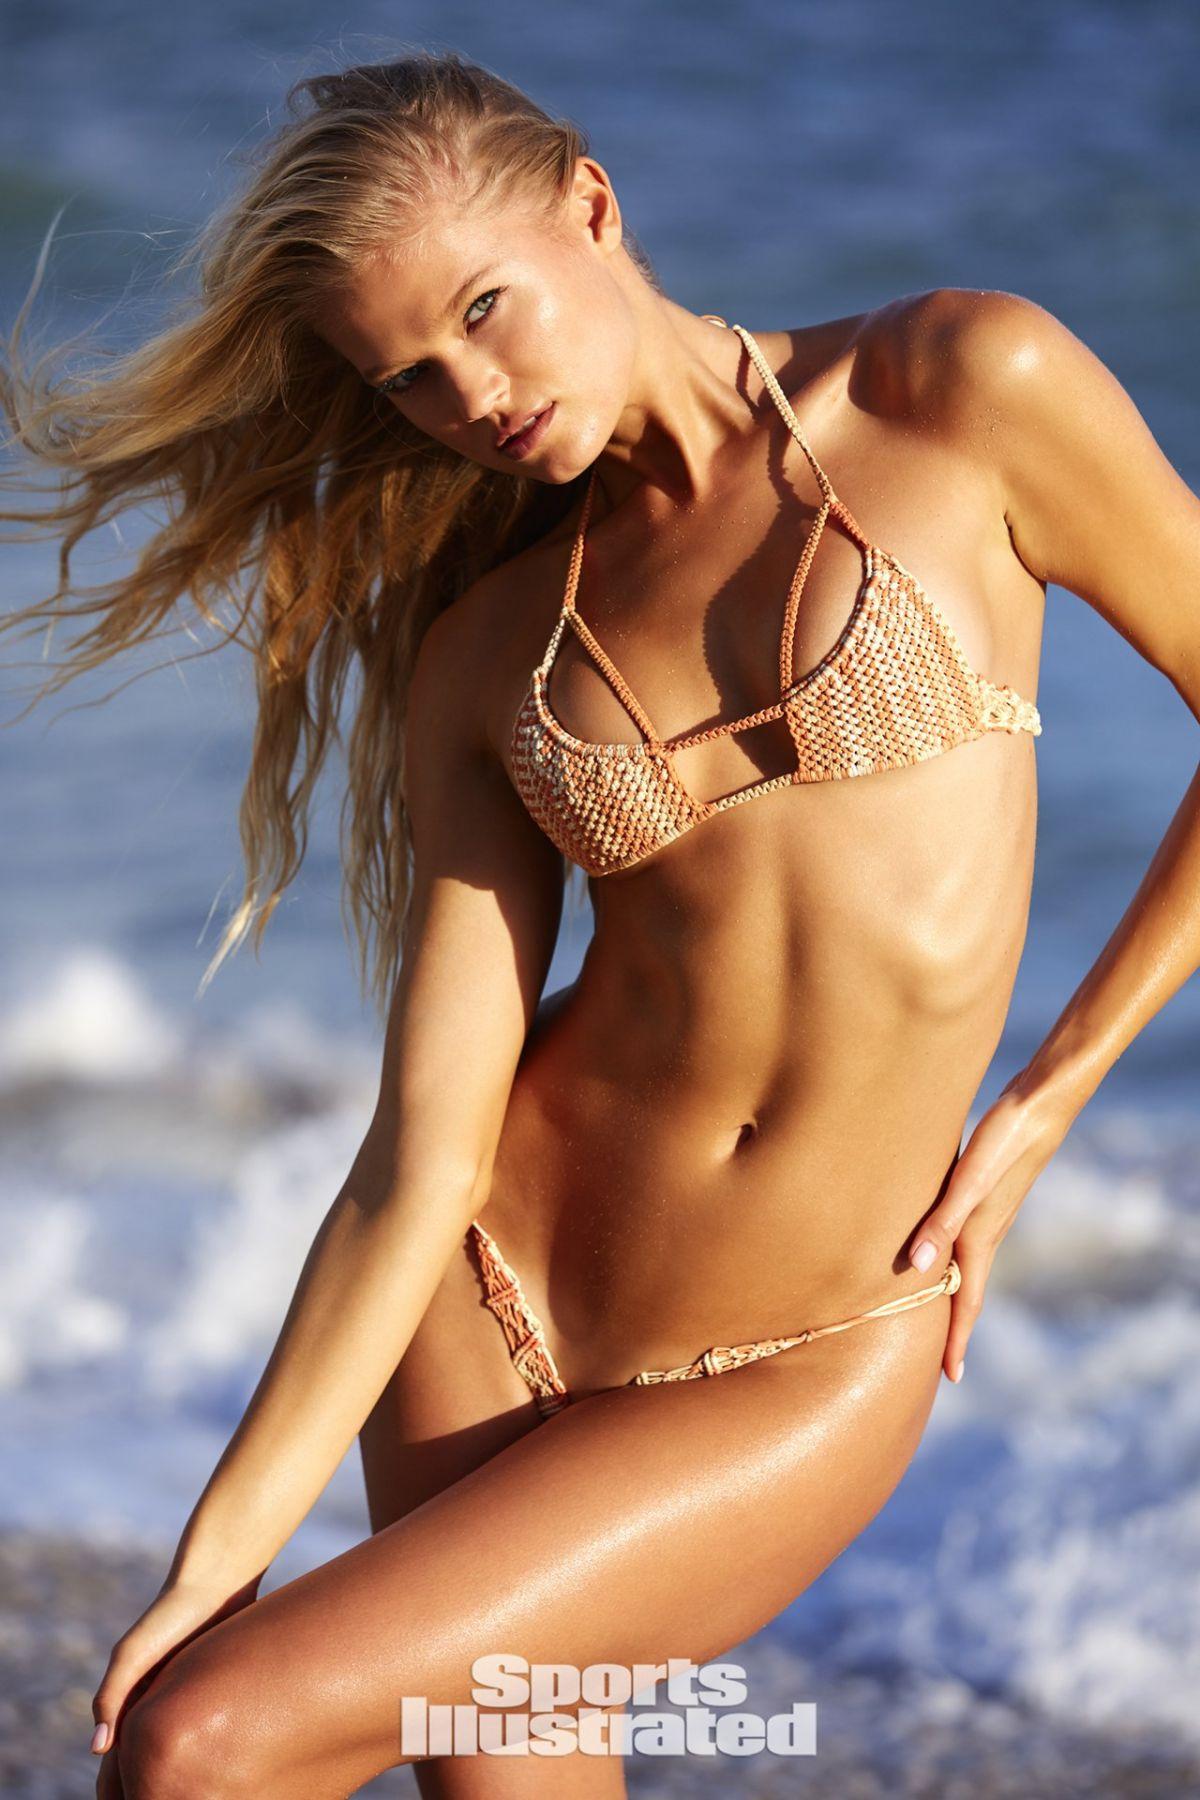 Instagram Evangelina Carrozzo nude (22 foto and video), Sexy, Bikini, Instagram, bra 2019